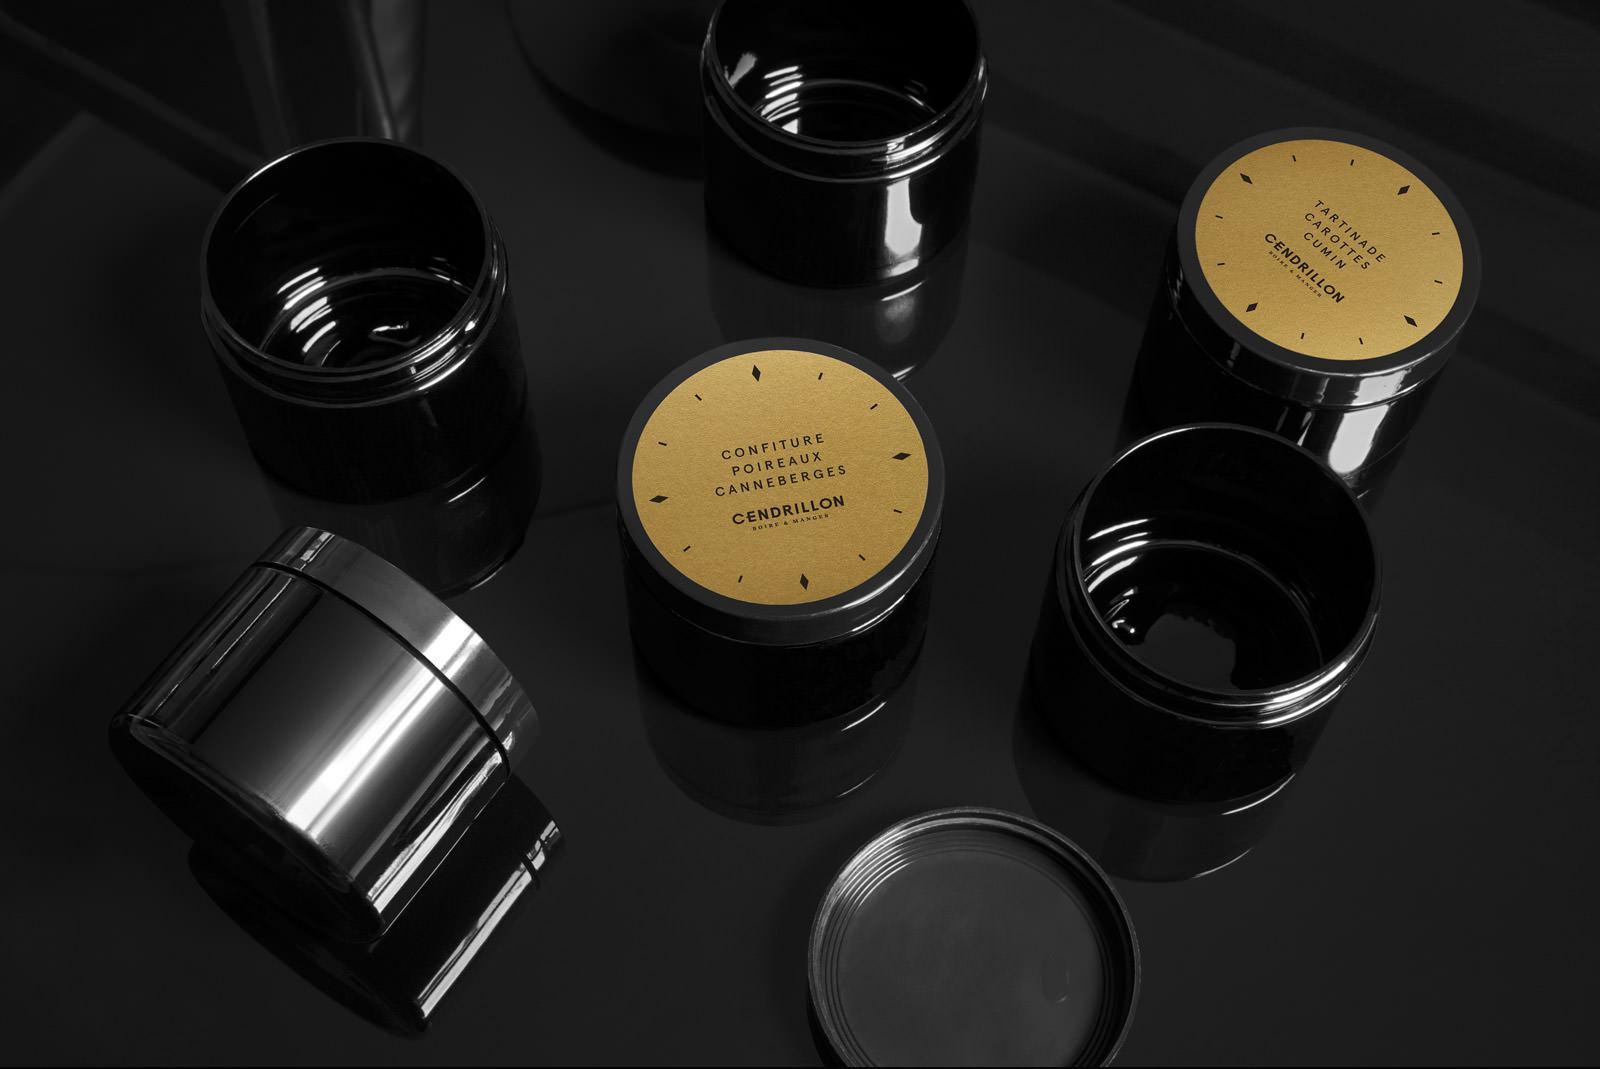 Figure-Jeremy-Hall-Design-Graphique-Logo-Branding-Image-De-Marque-Cendrillon-Restaurant-Packaging-Emballage-13.jpg